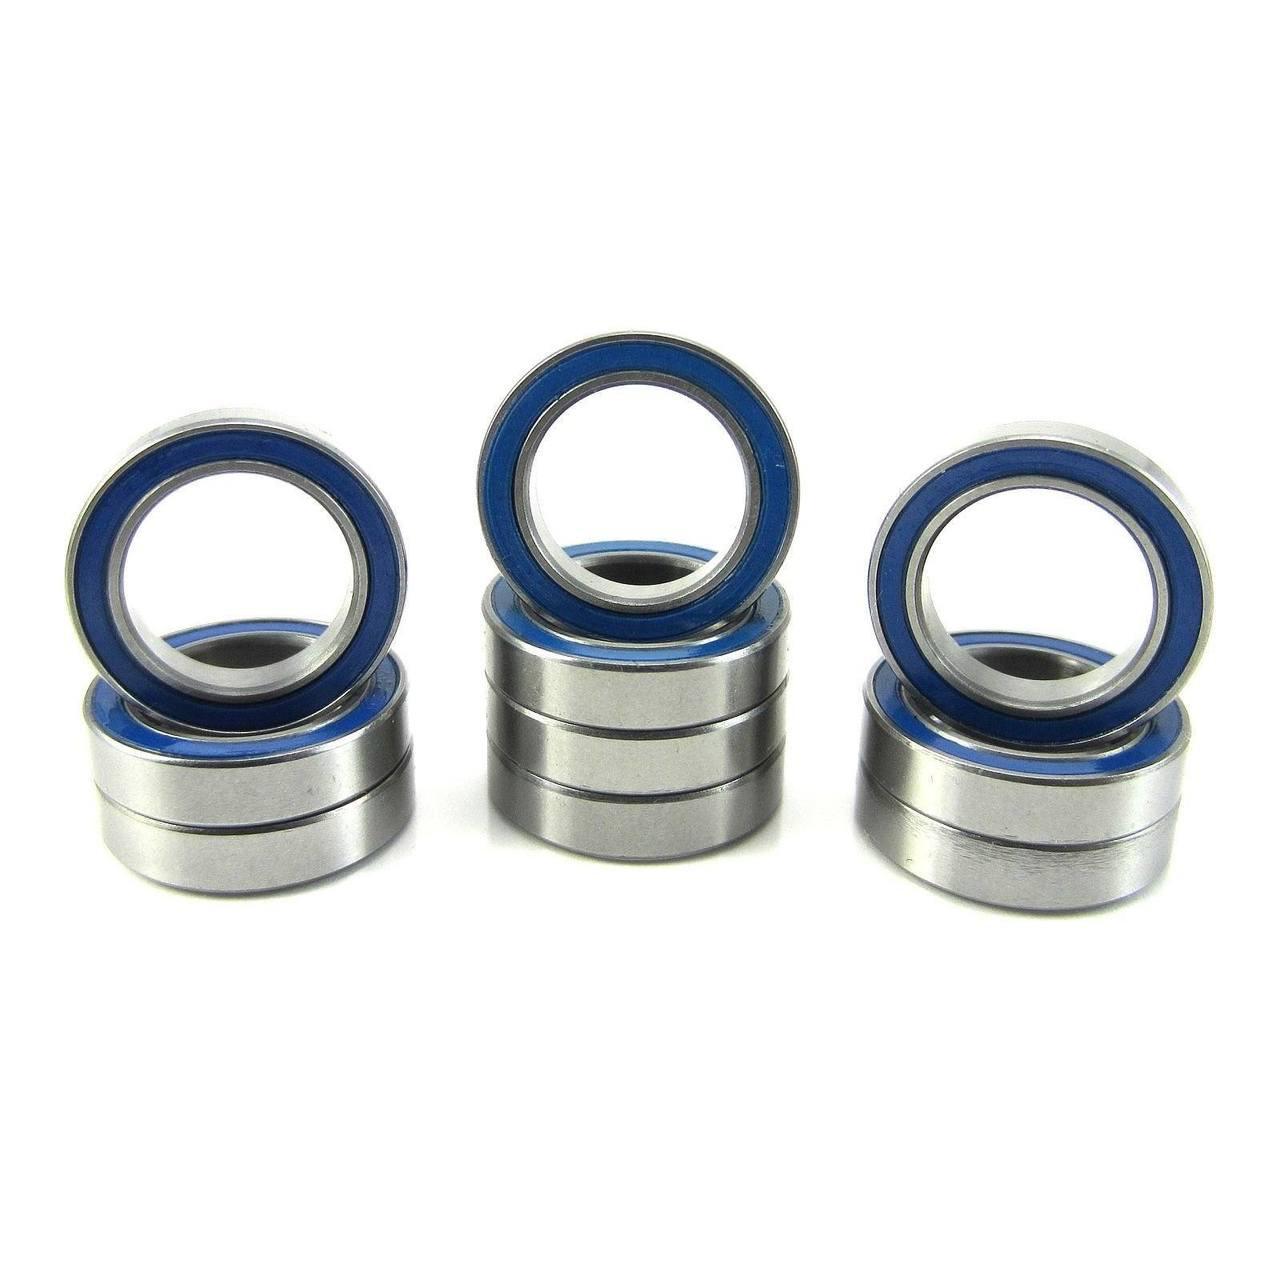 TRB RC 12x18x4mm Precision Ball Bearings ABEC 3 Rubber Sealed BLU (10)